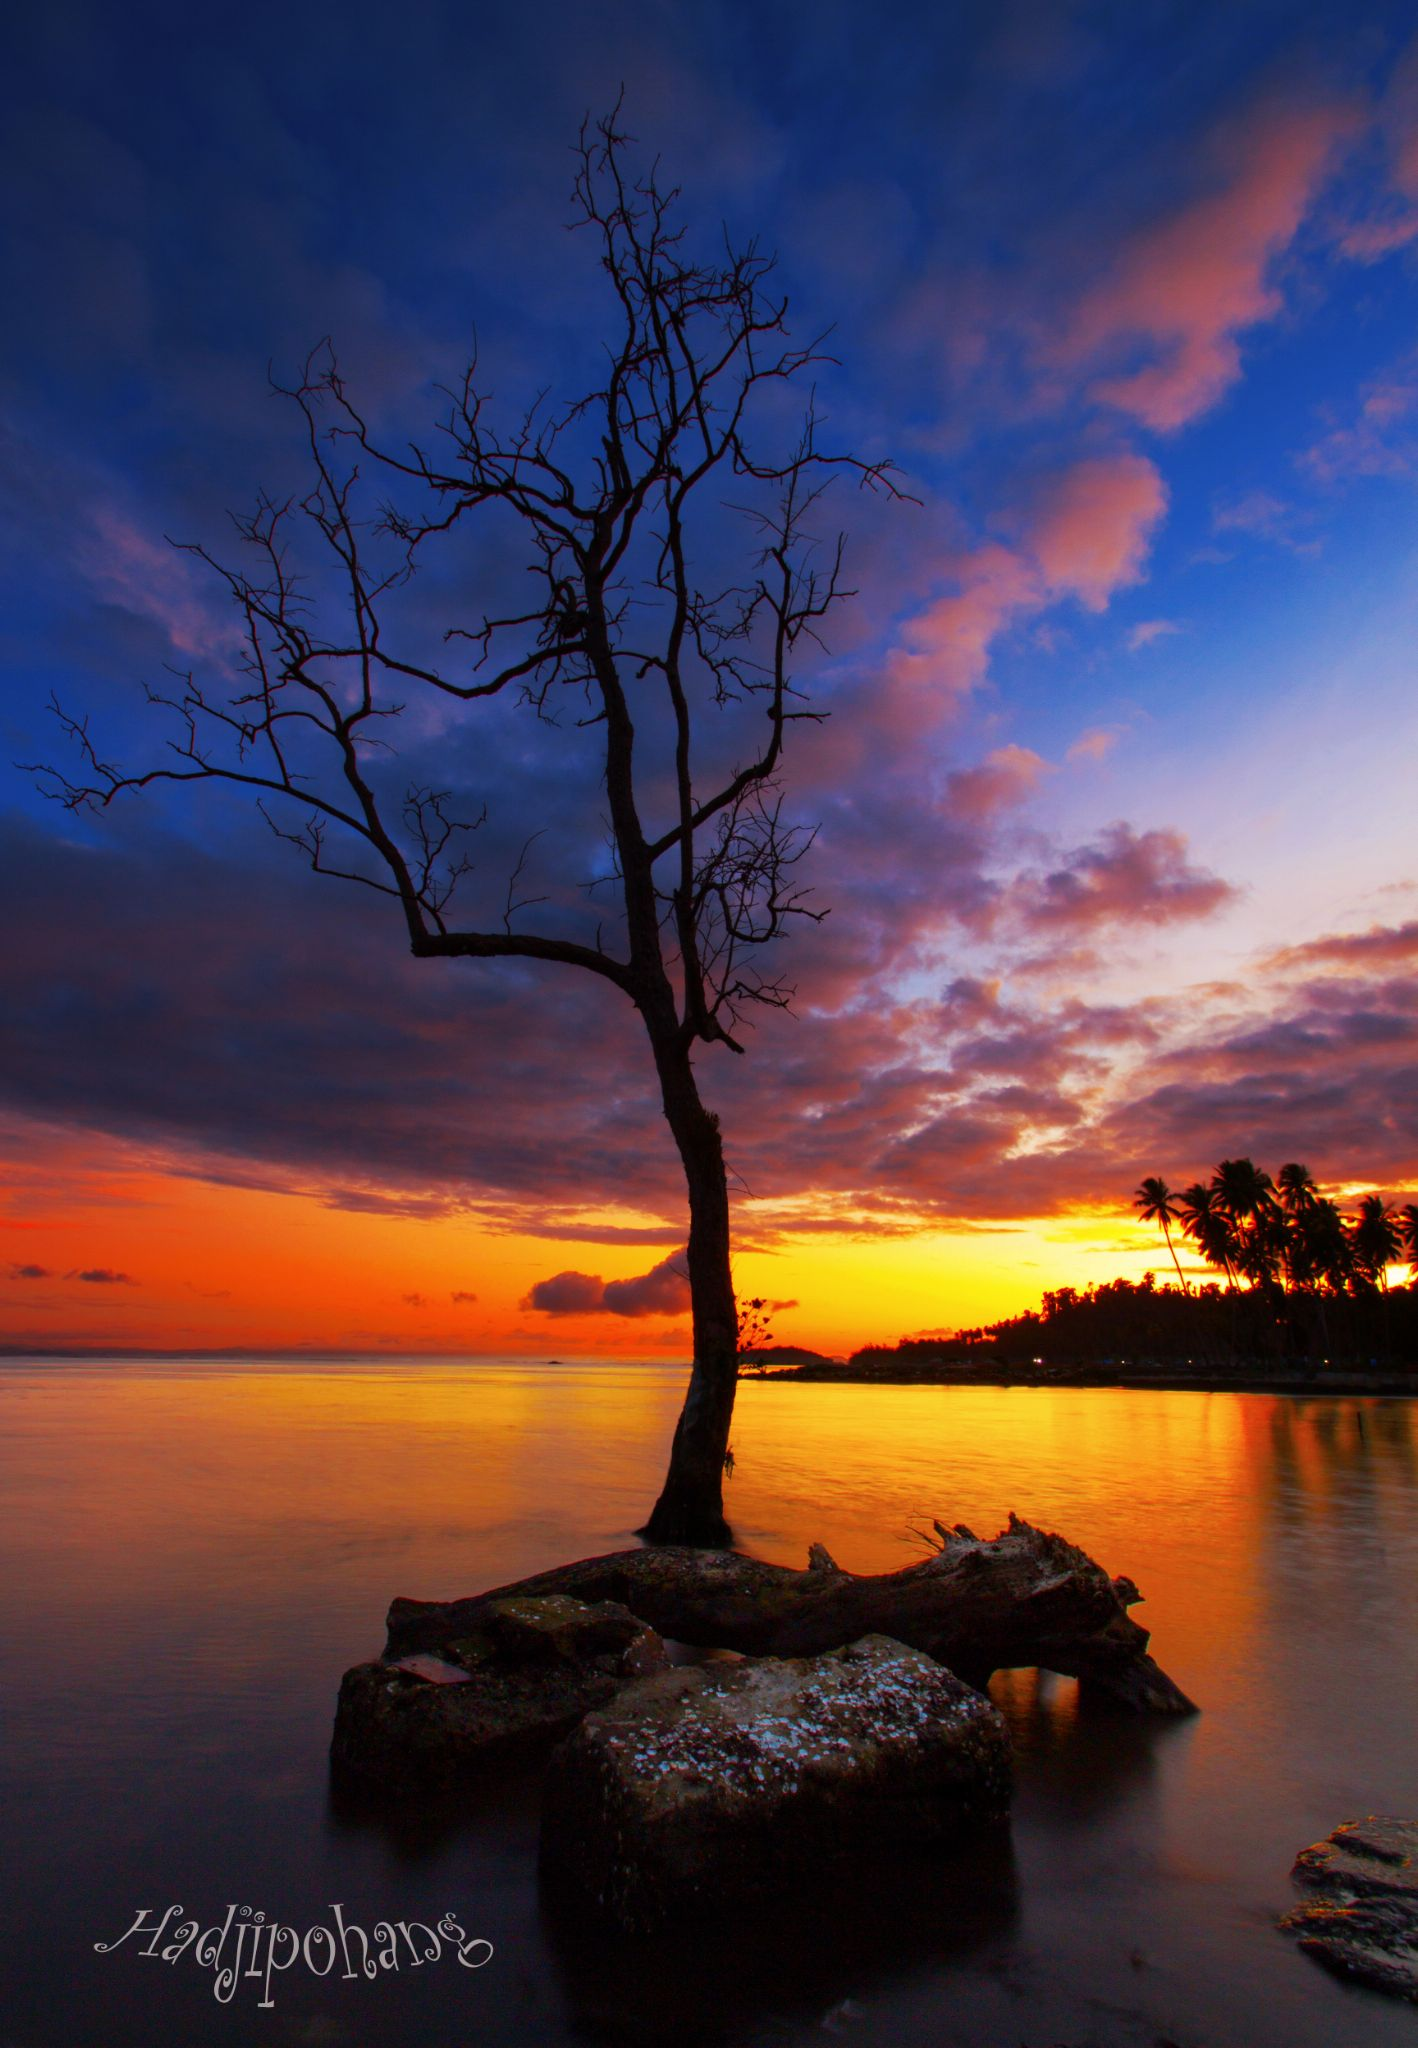 In Papua by Hadjipohang